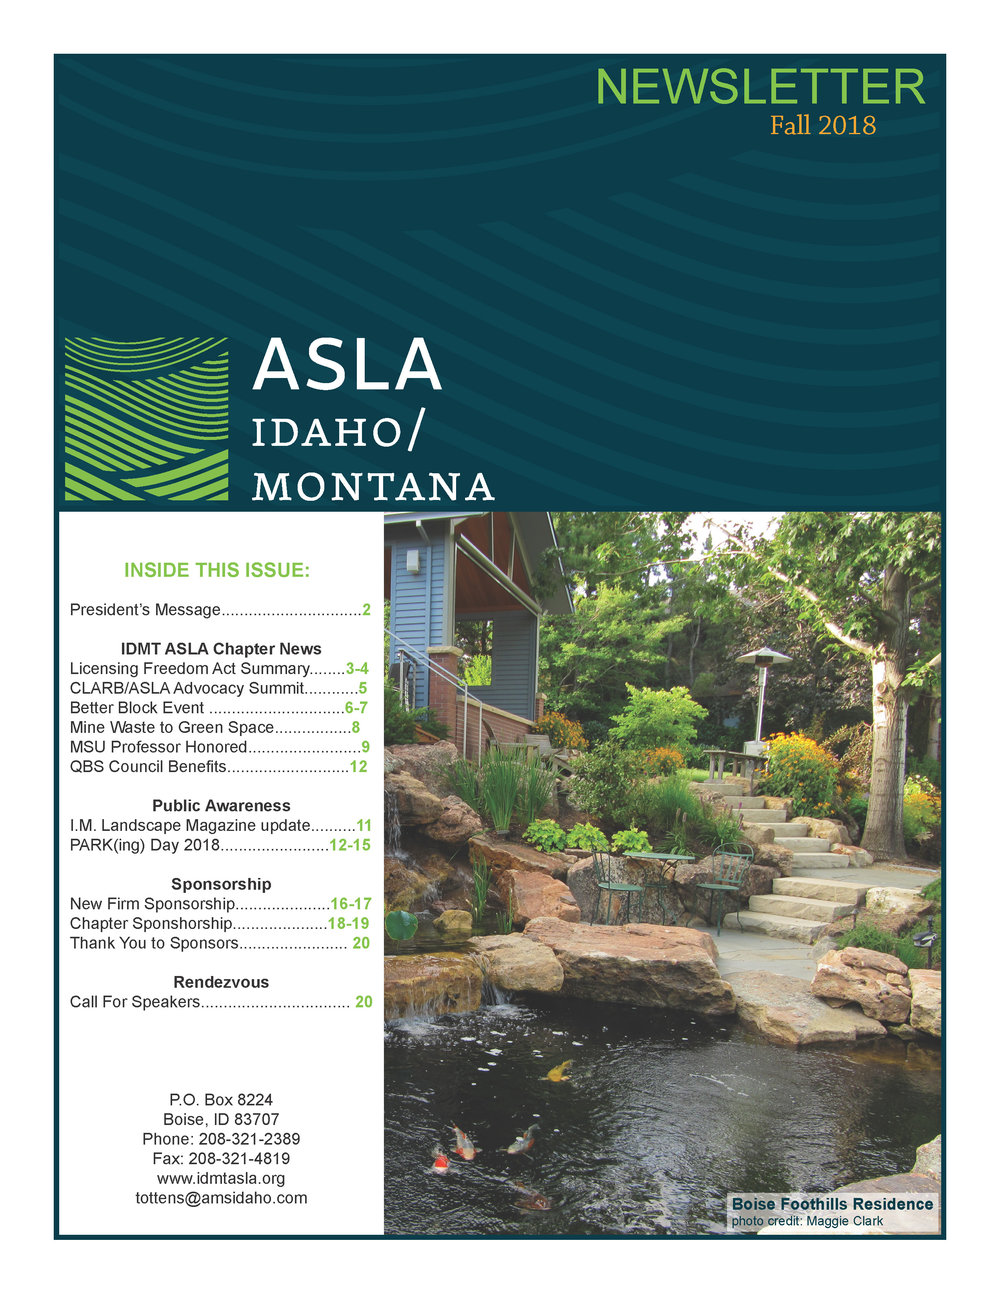 IDMT ASLA Newsletter